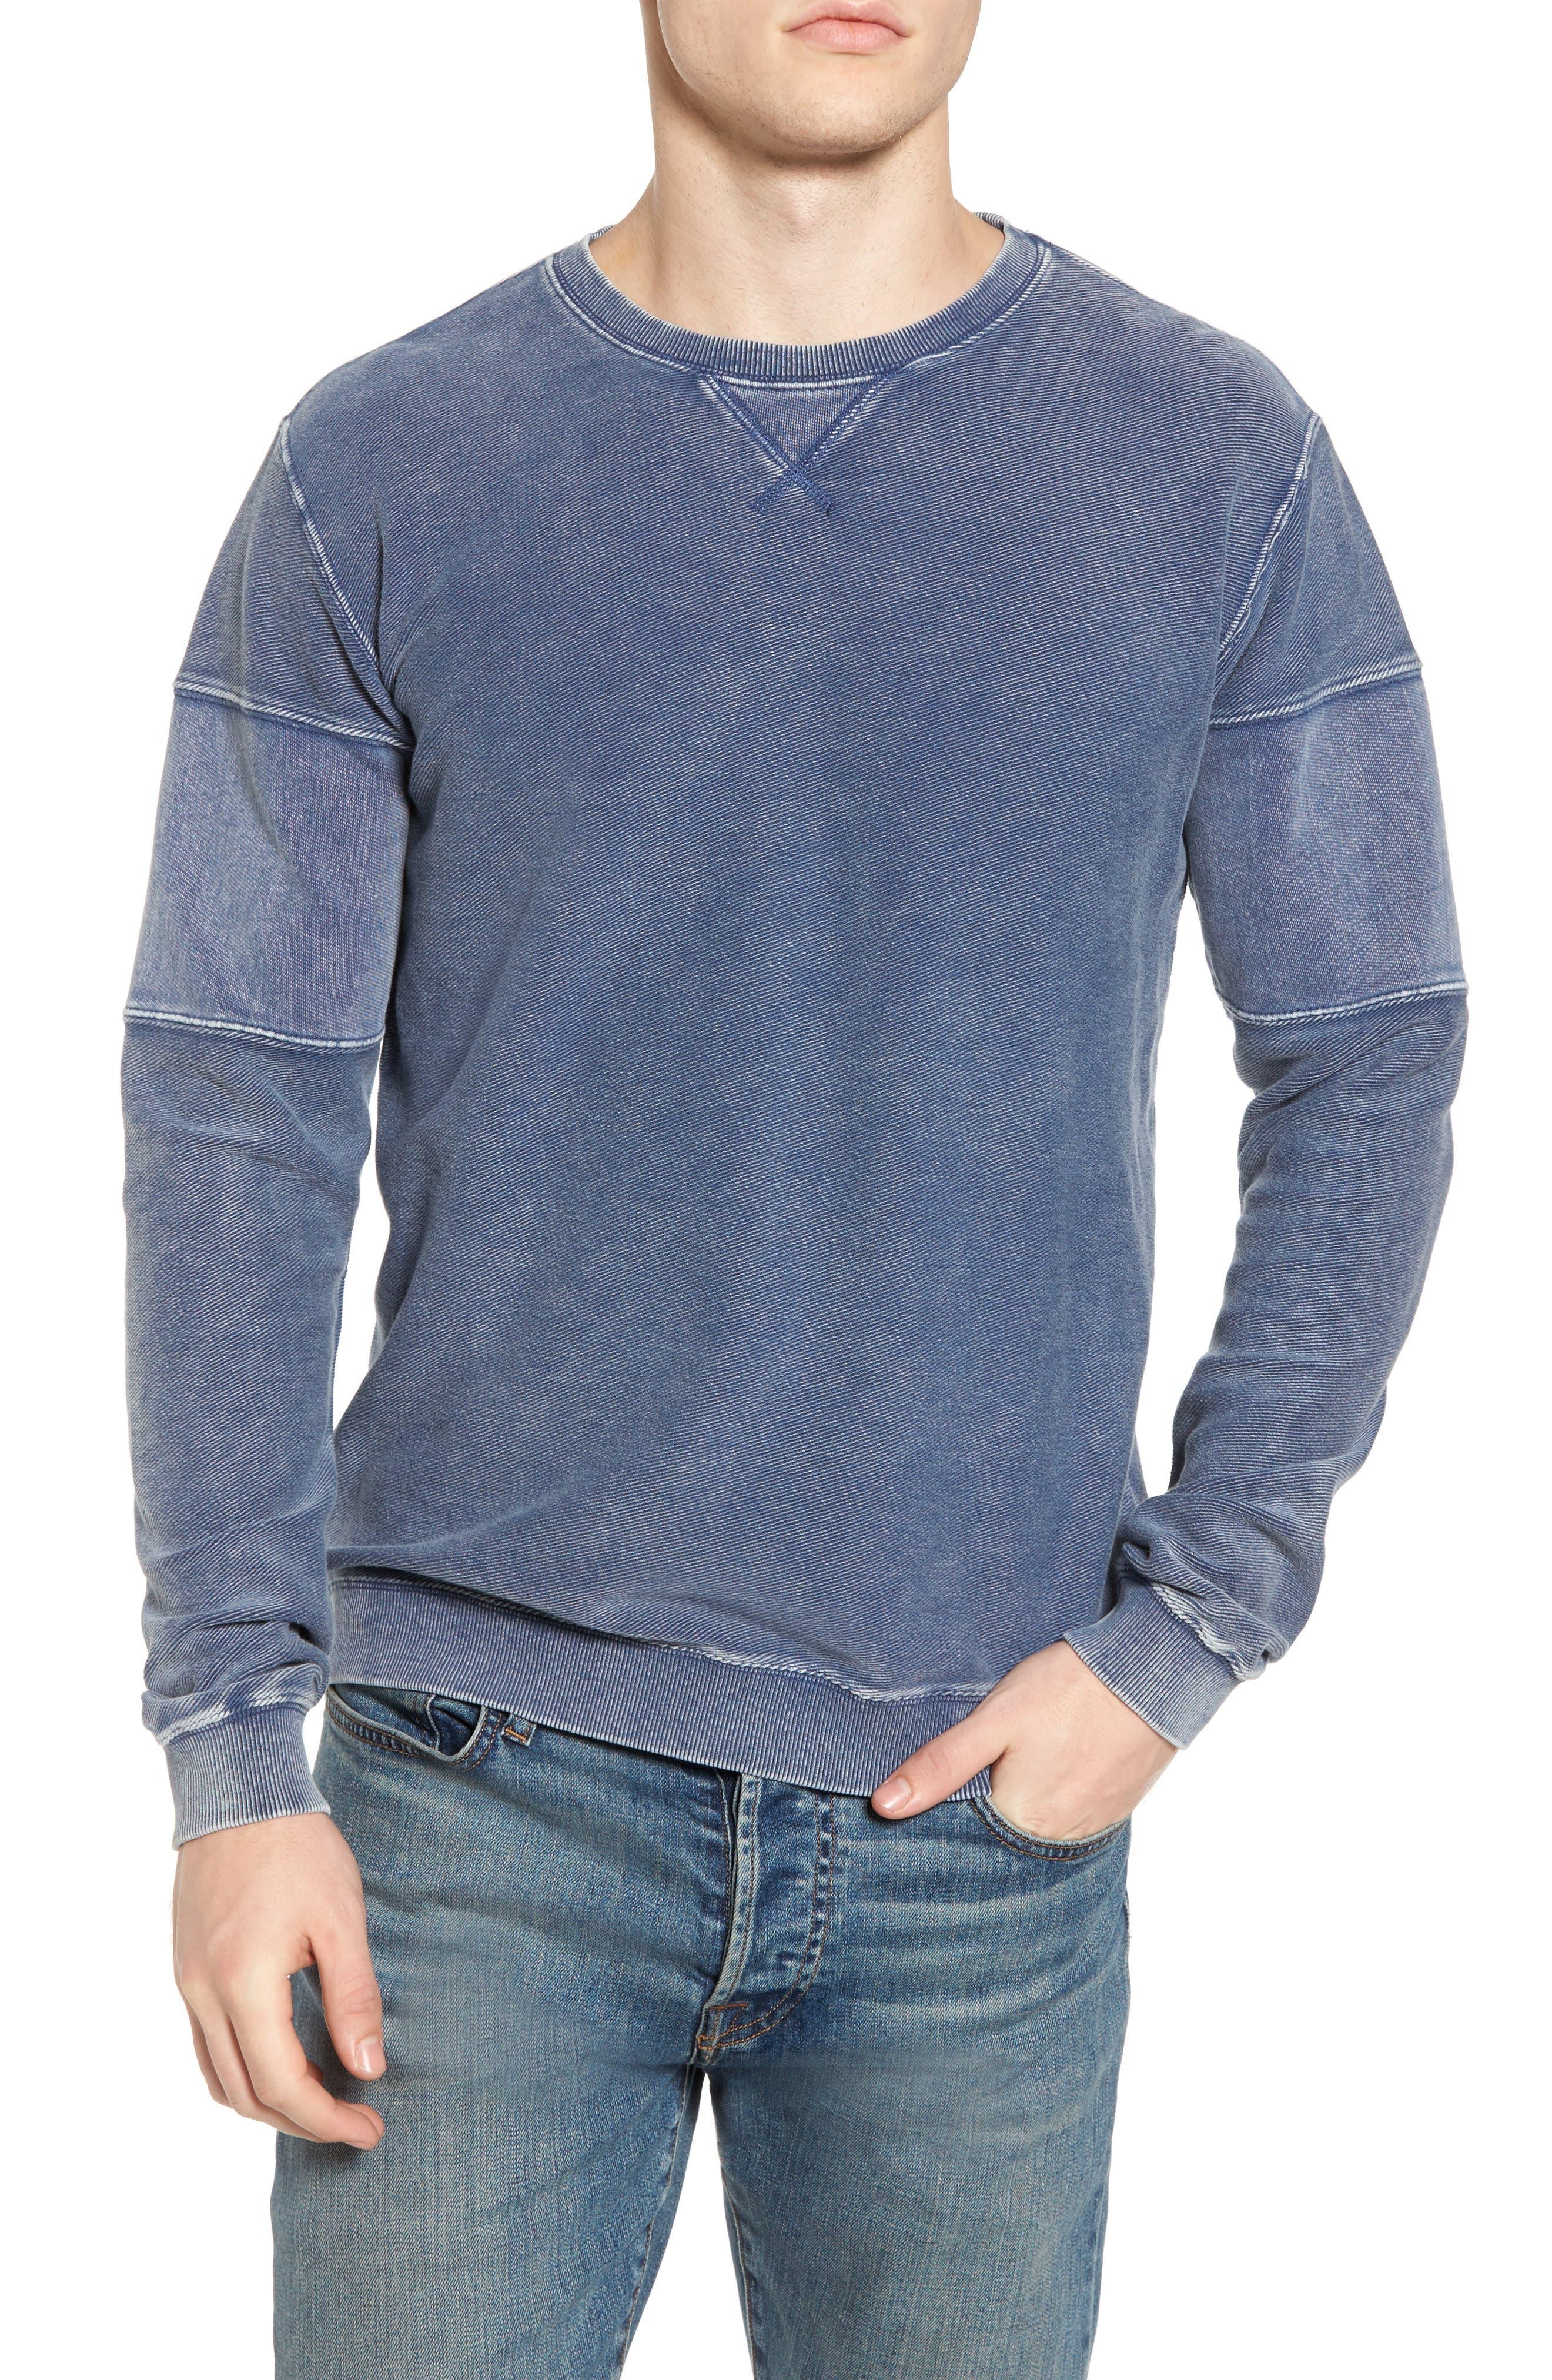 Distressed Sweatshirt,                             Main thumbnail 1, color,                             475